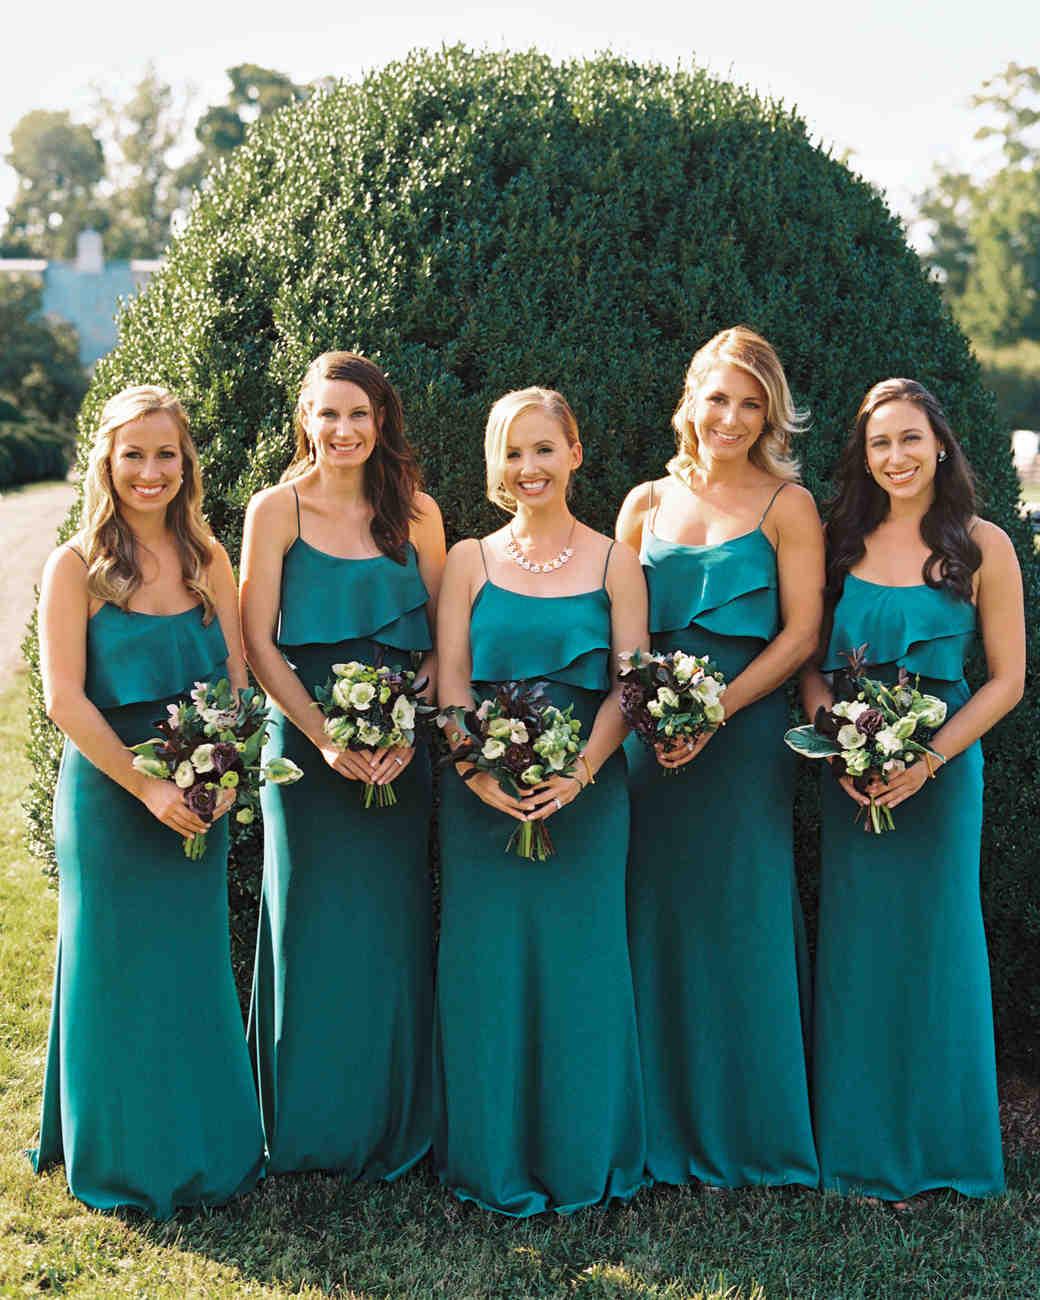 kristina-barrett-wedding-martha-farm-cl11c21-r01-023-rt-r-d112650.jpg